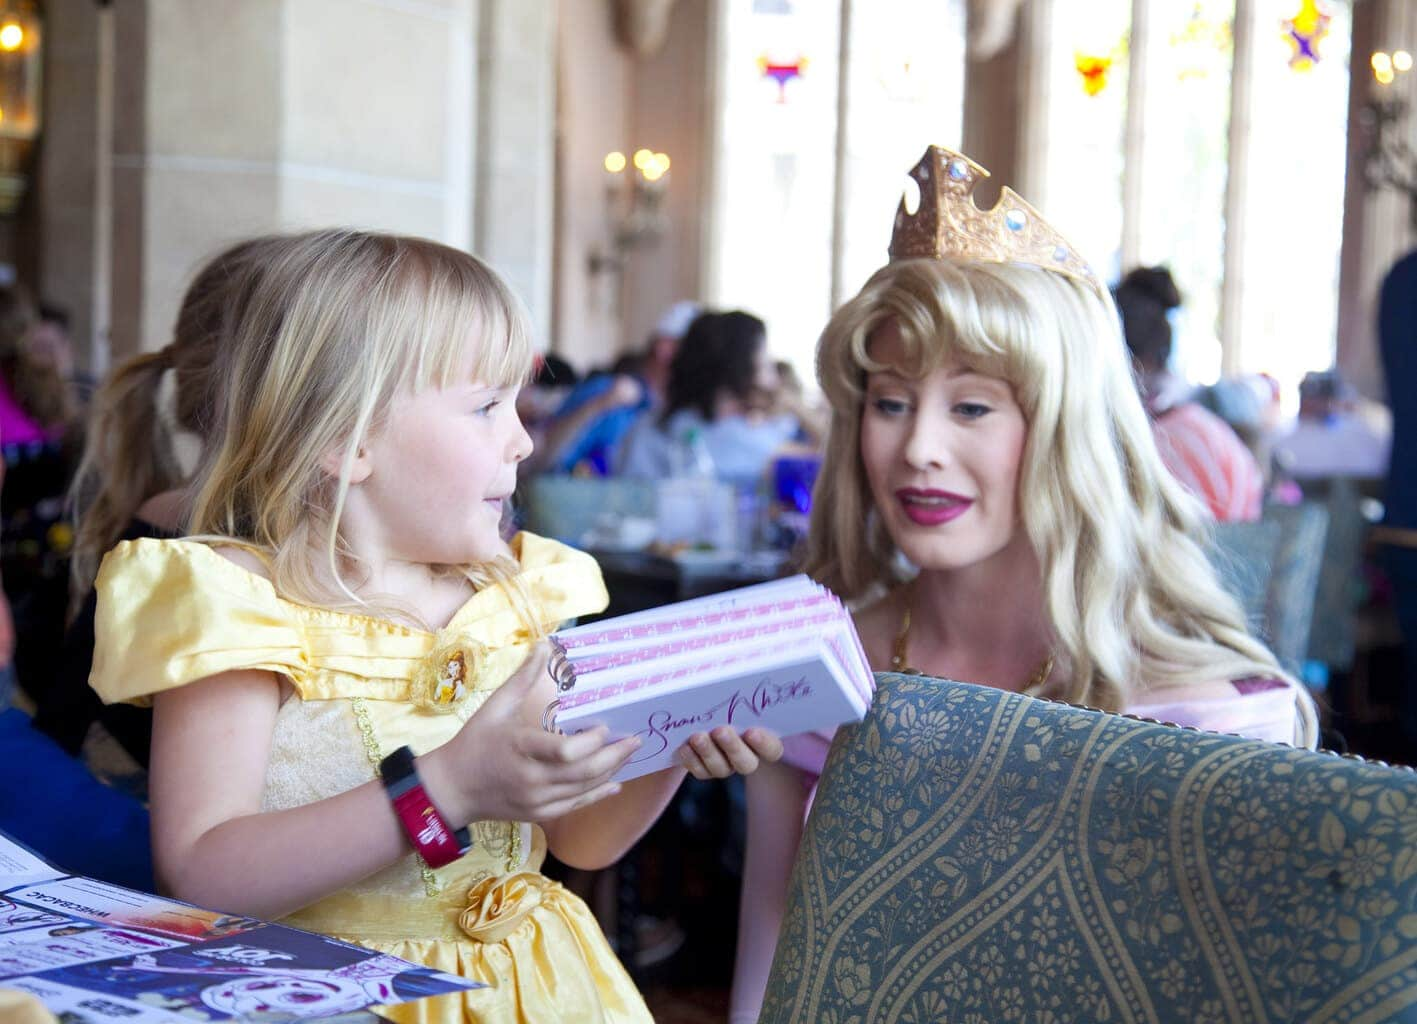 Top 5 Places to find Disney Princesses at Walt Disney World